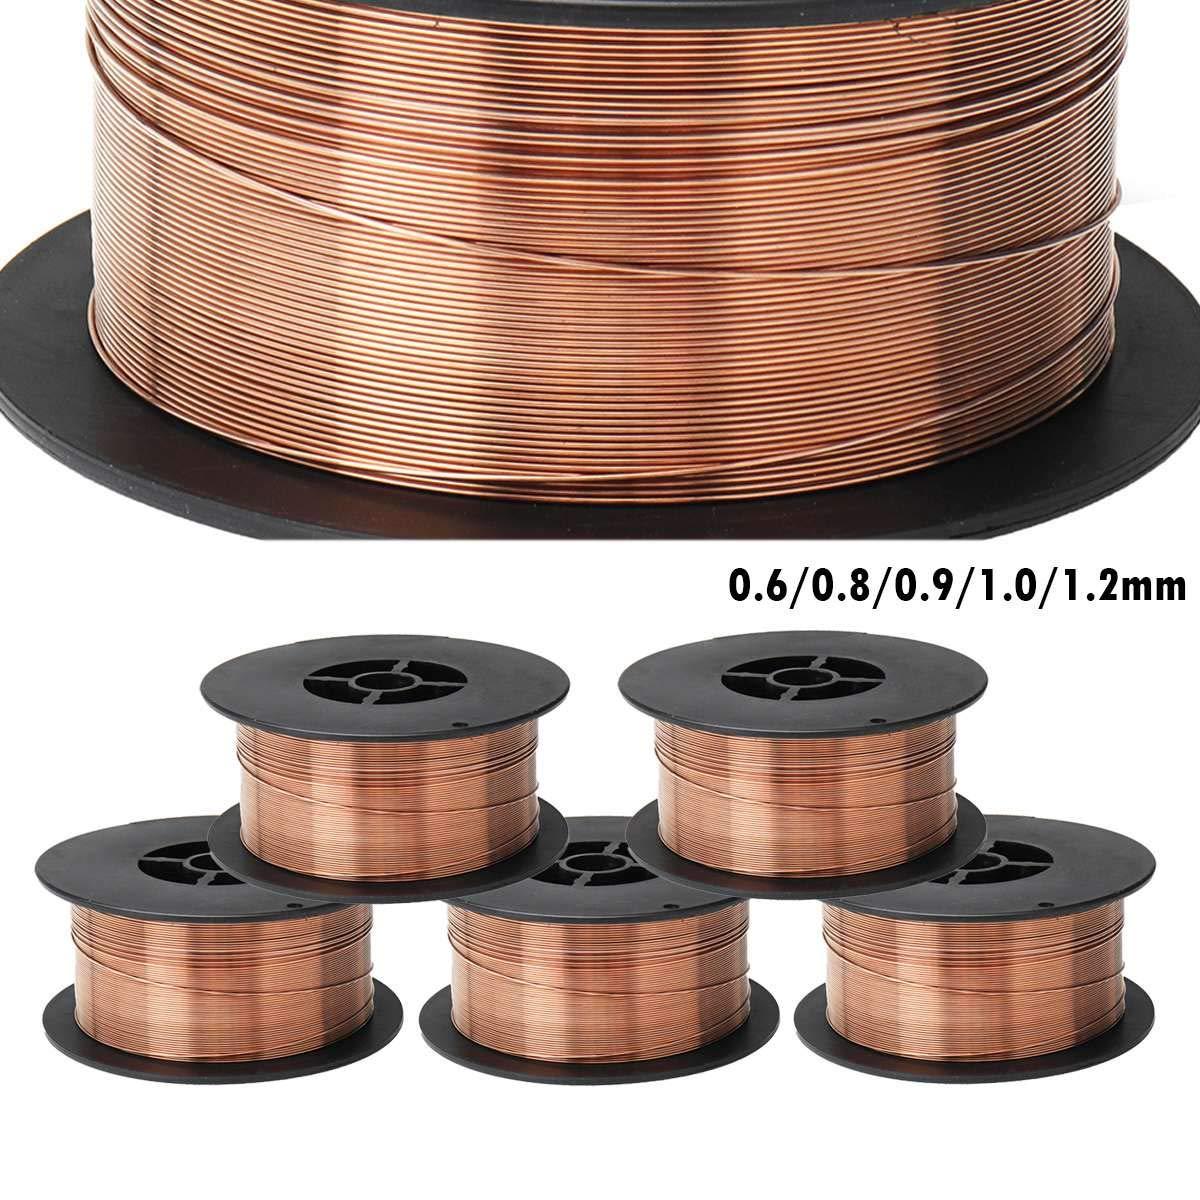 0.6/0.8/0.9/1.0/1.2mm 1KG Carbon Steel Gas Shielded Welding Wire Mild Steel ER70S-6 / ER50-6 MIG Welding Wires,0.8mm by WGang